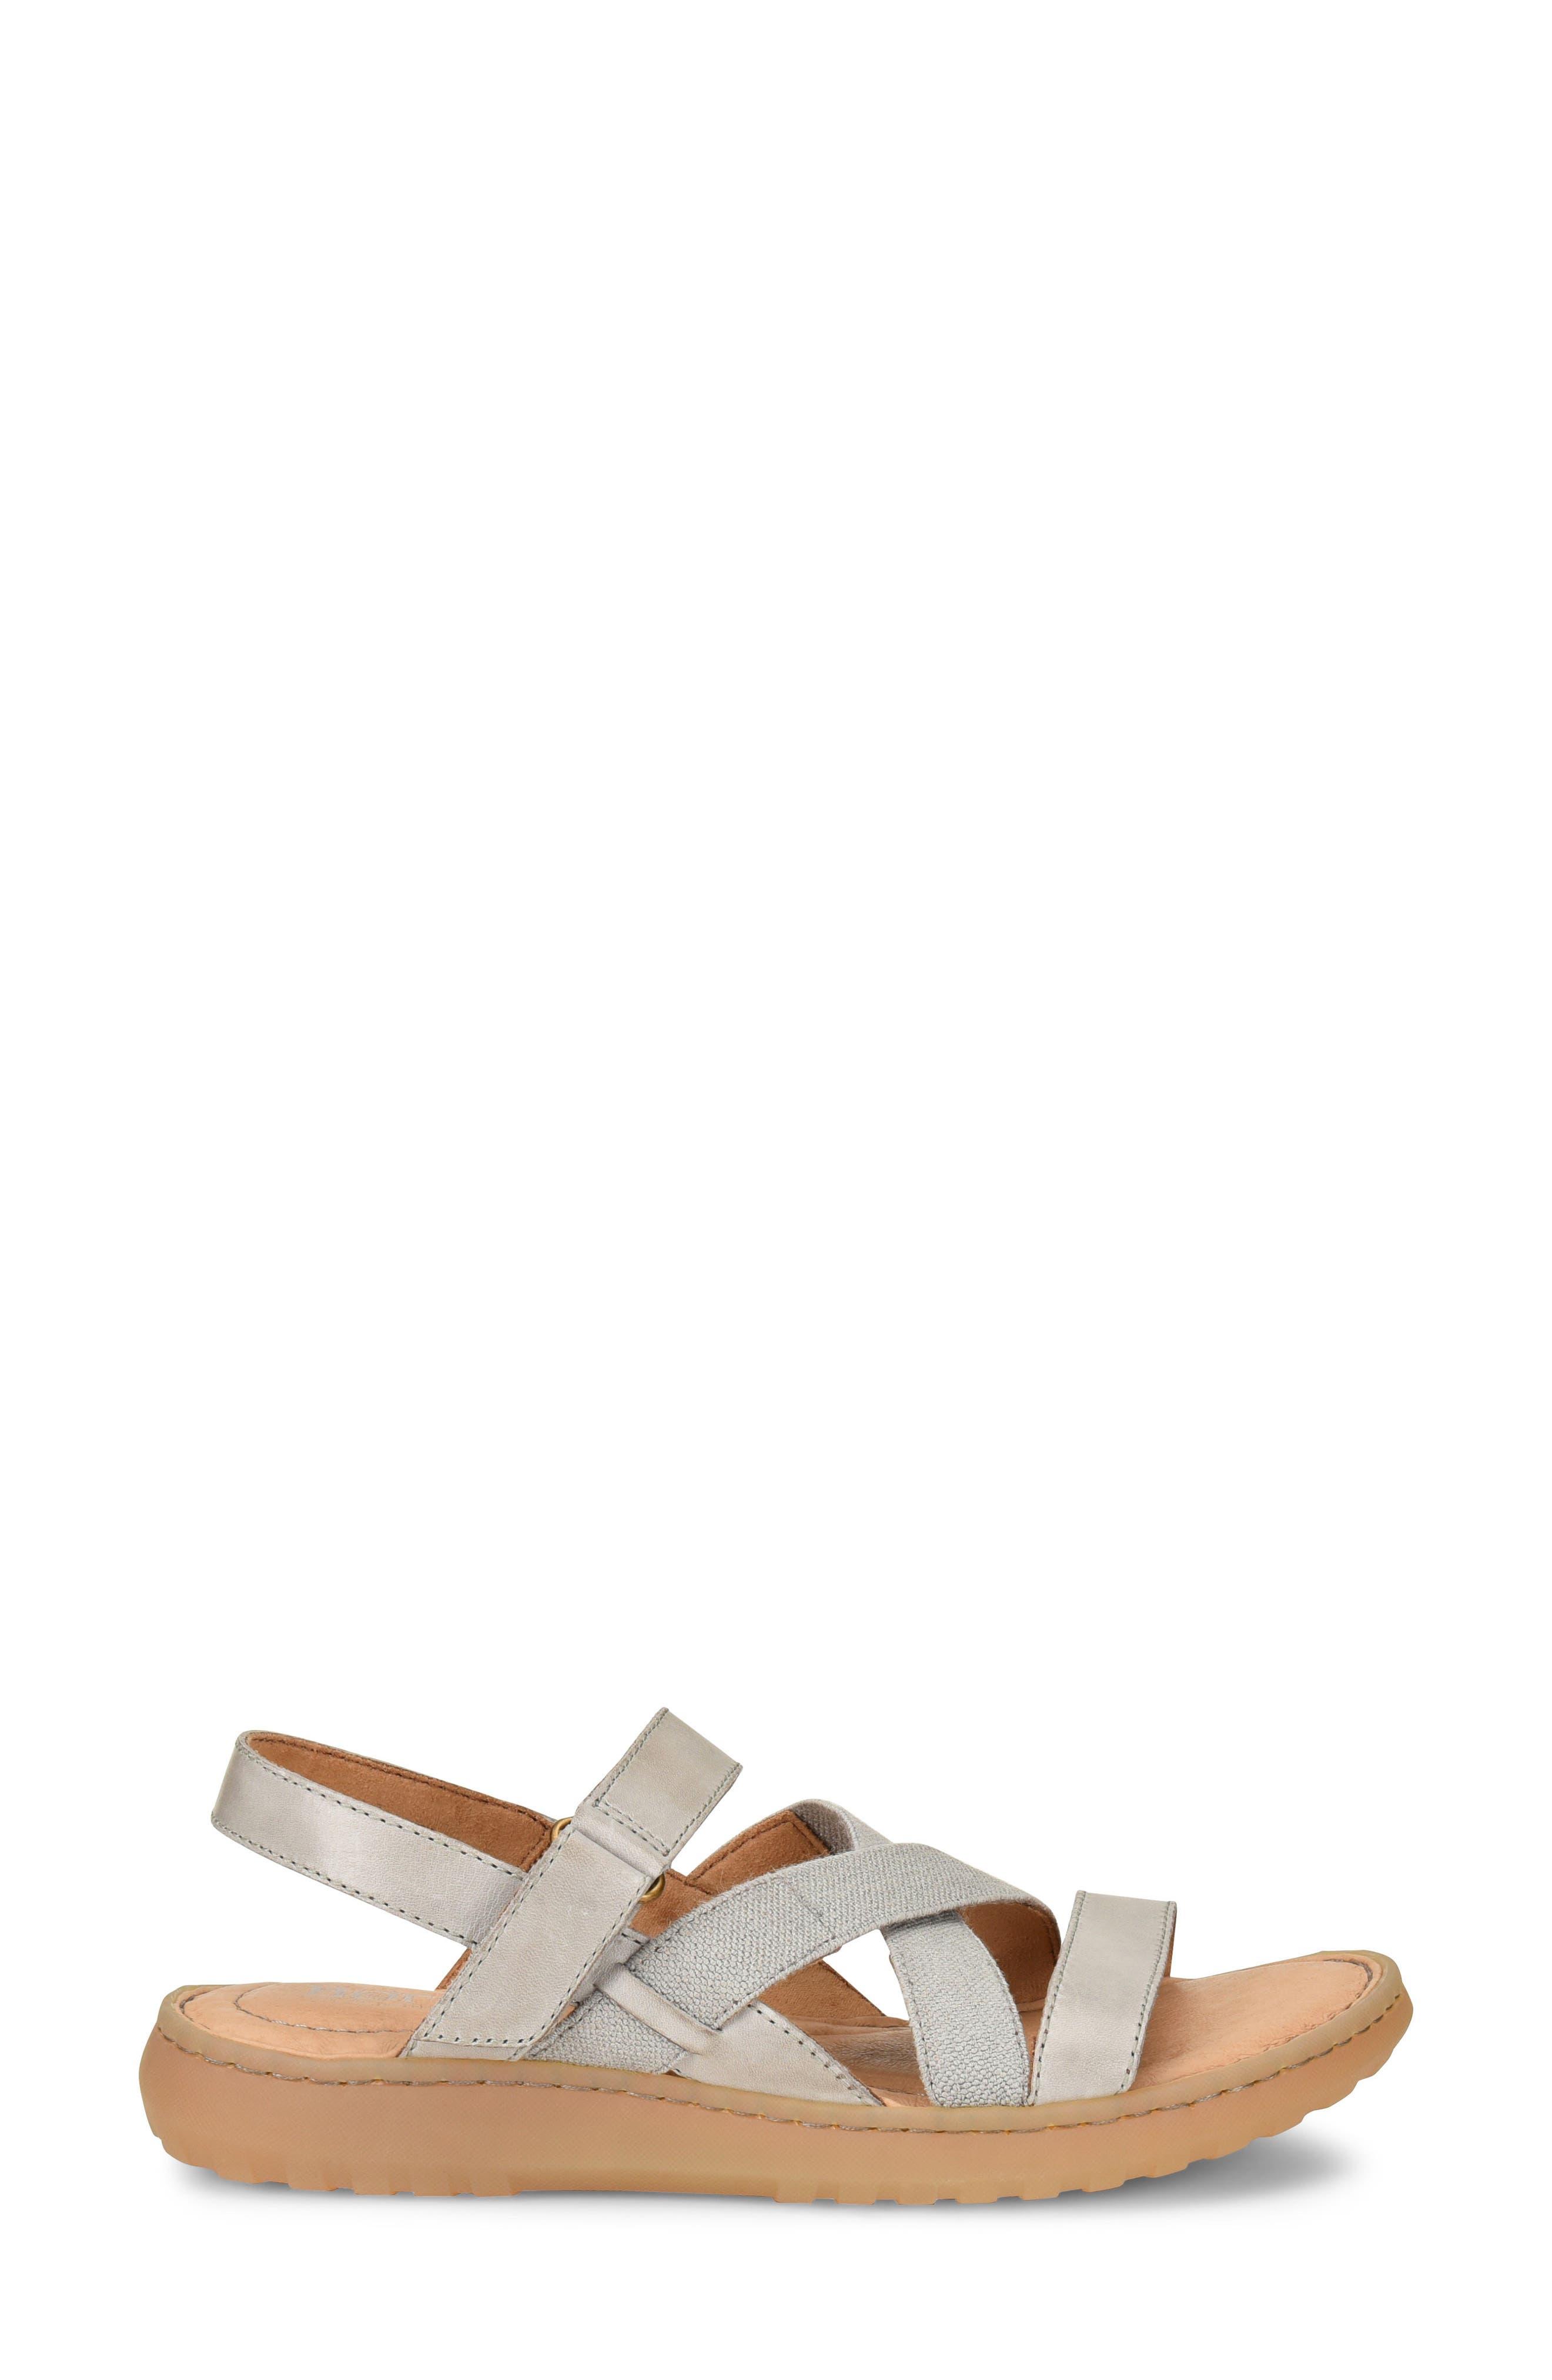 Manta Sandal,                             Alternate thumbnail 3, color,                             Light Grey Leather